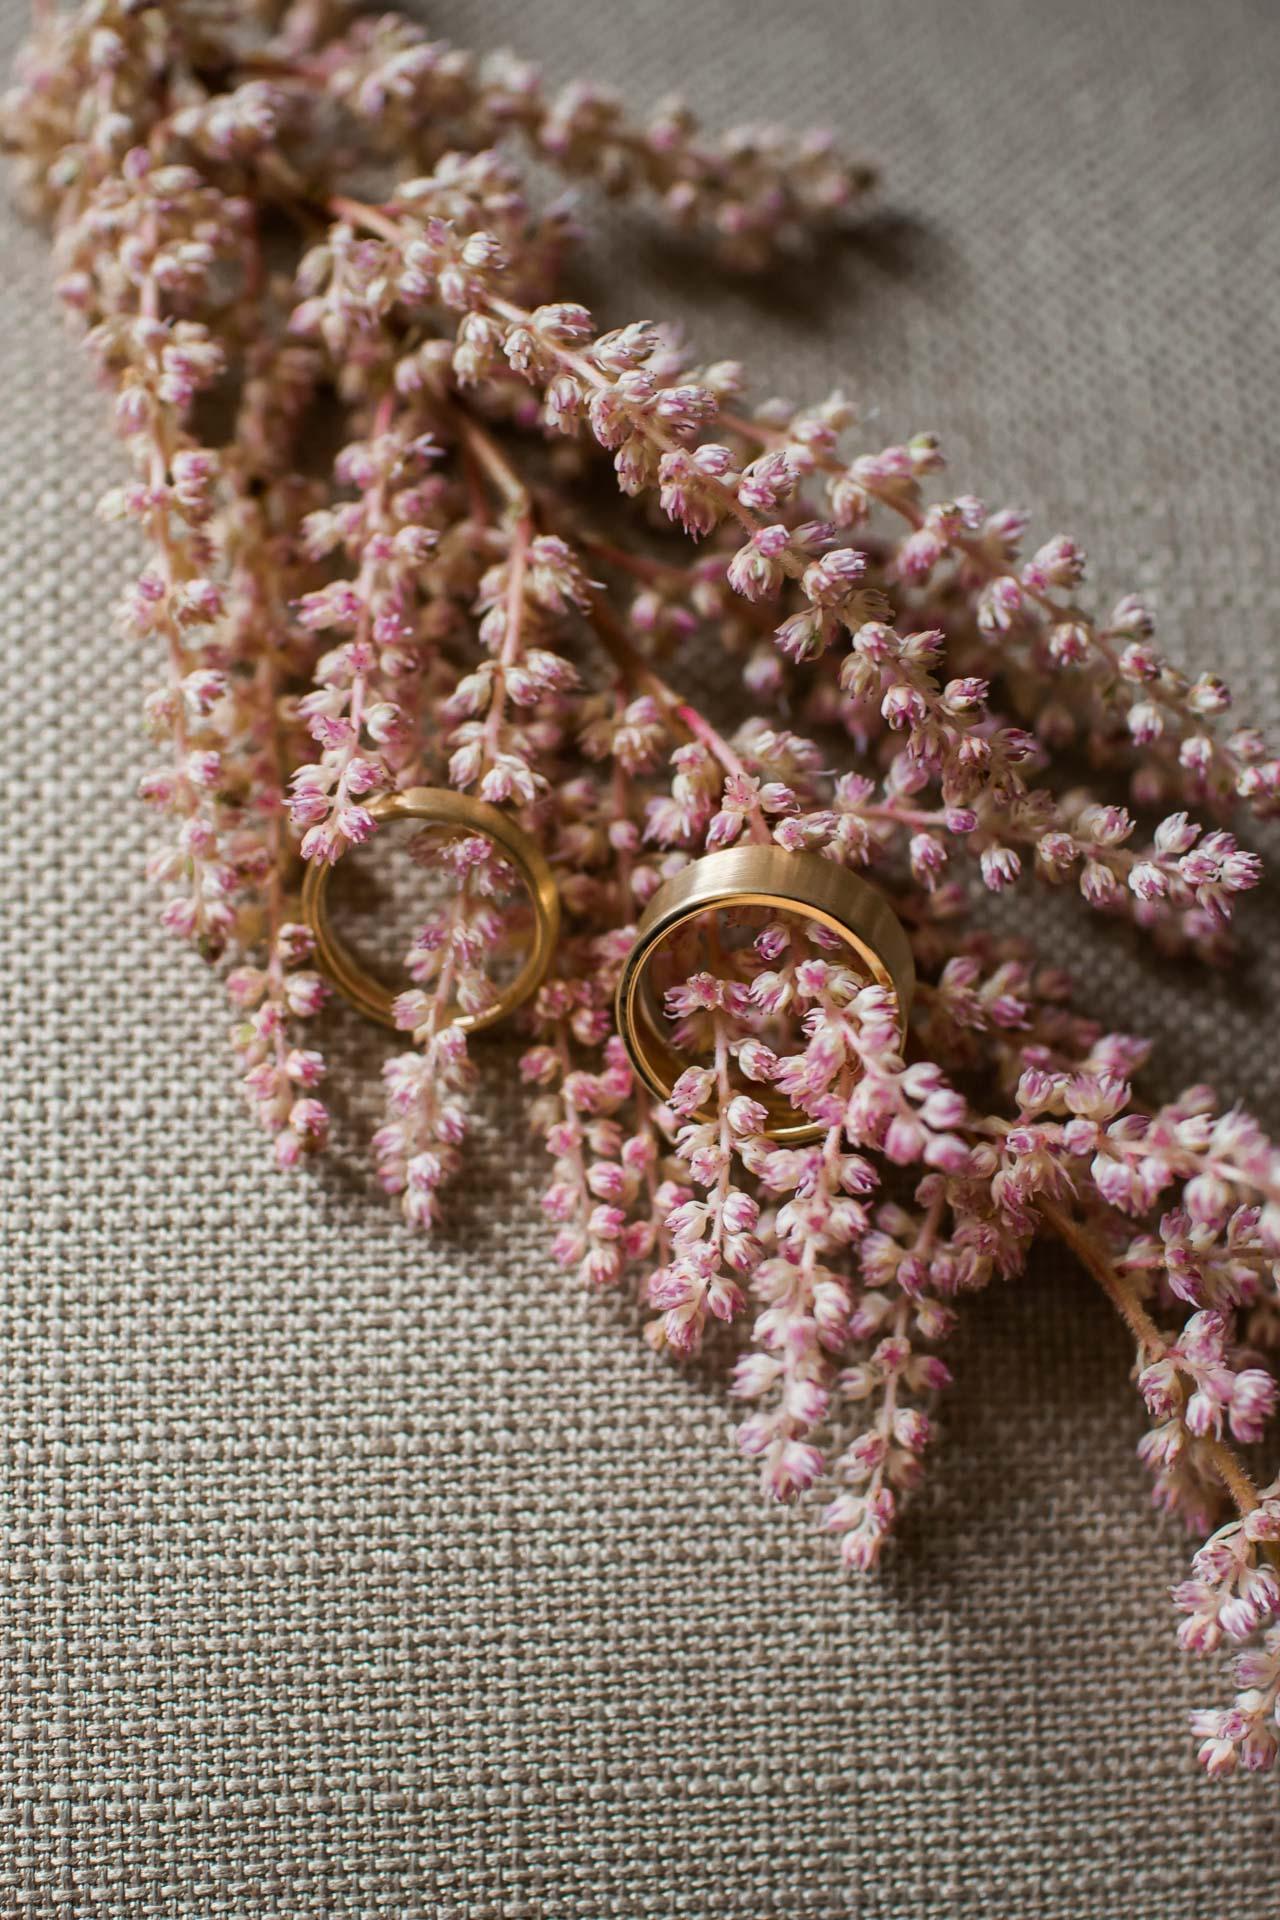 Hochzeitsringe, Wedding rings